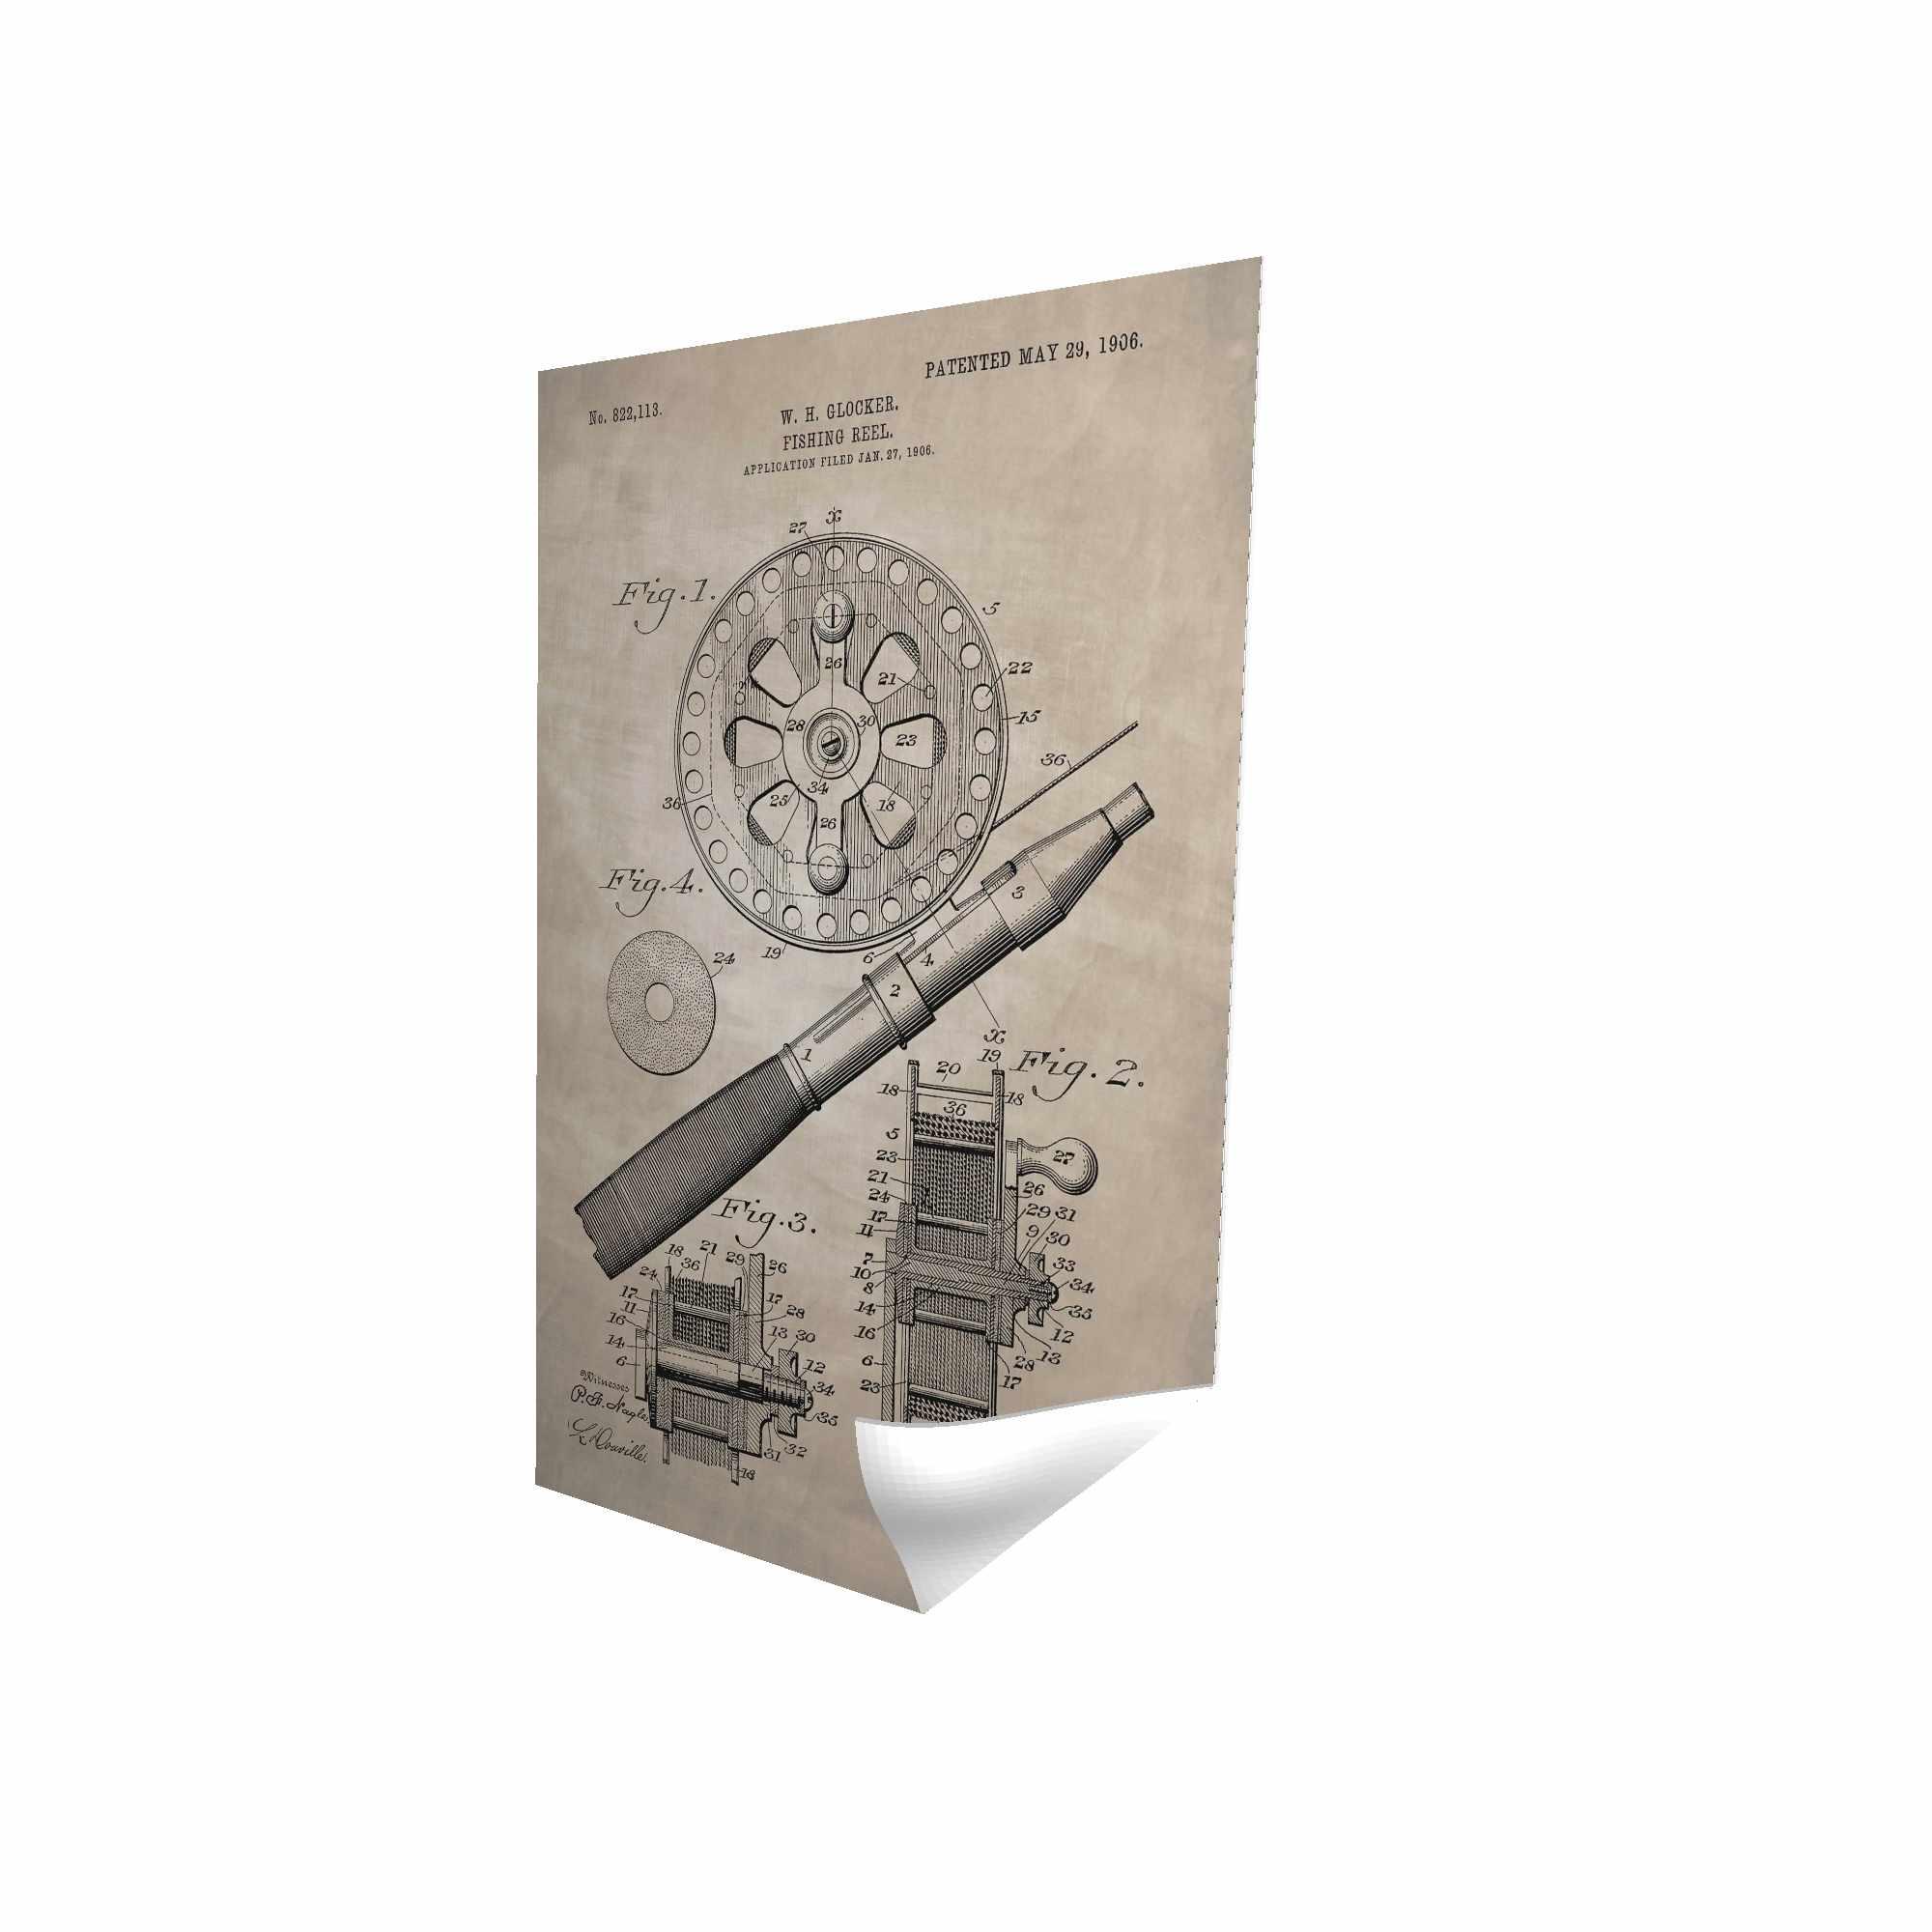 Beige blueprint of a fishing reel